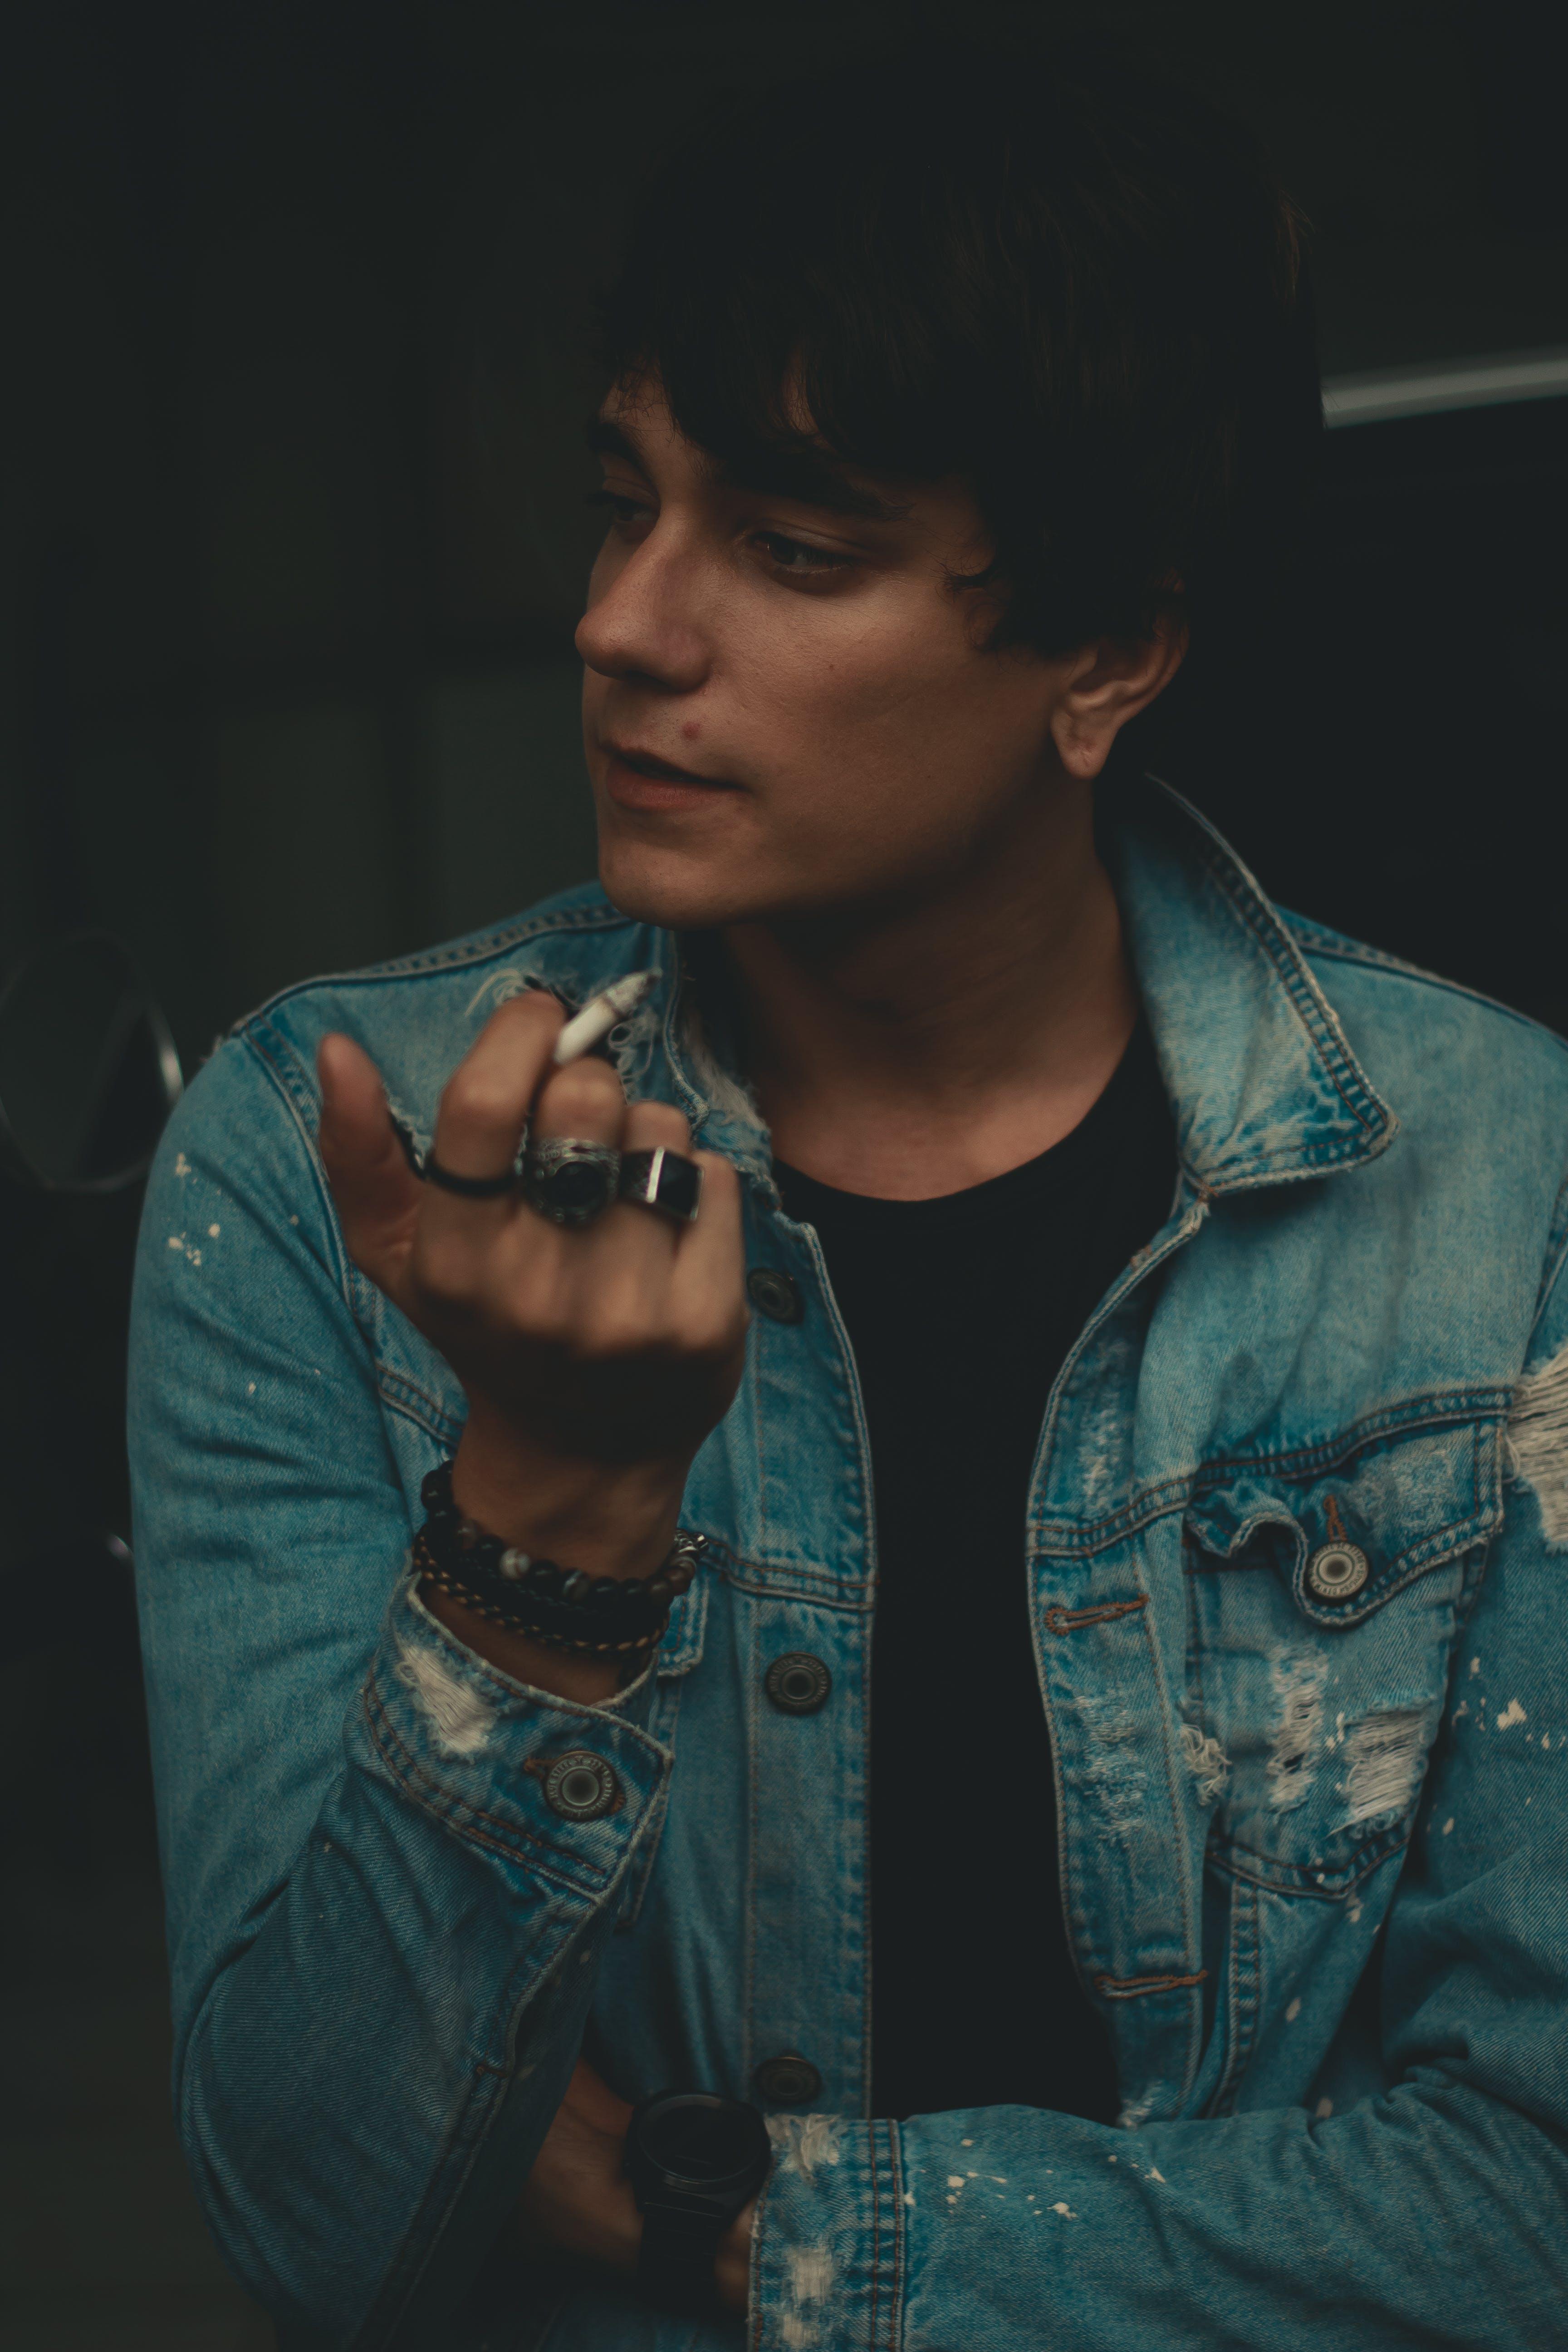 Man Holding Cigarette